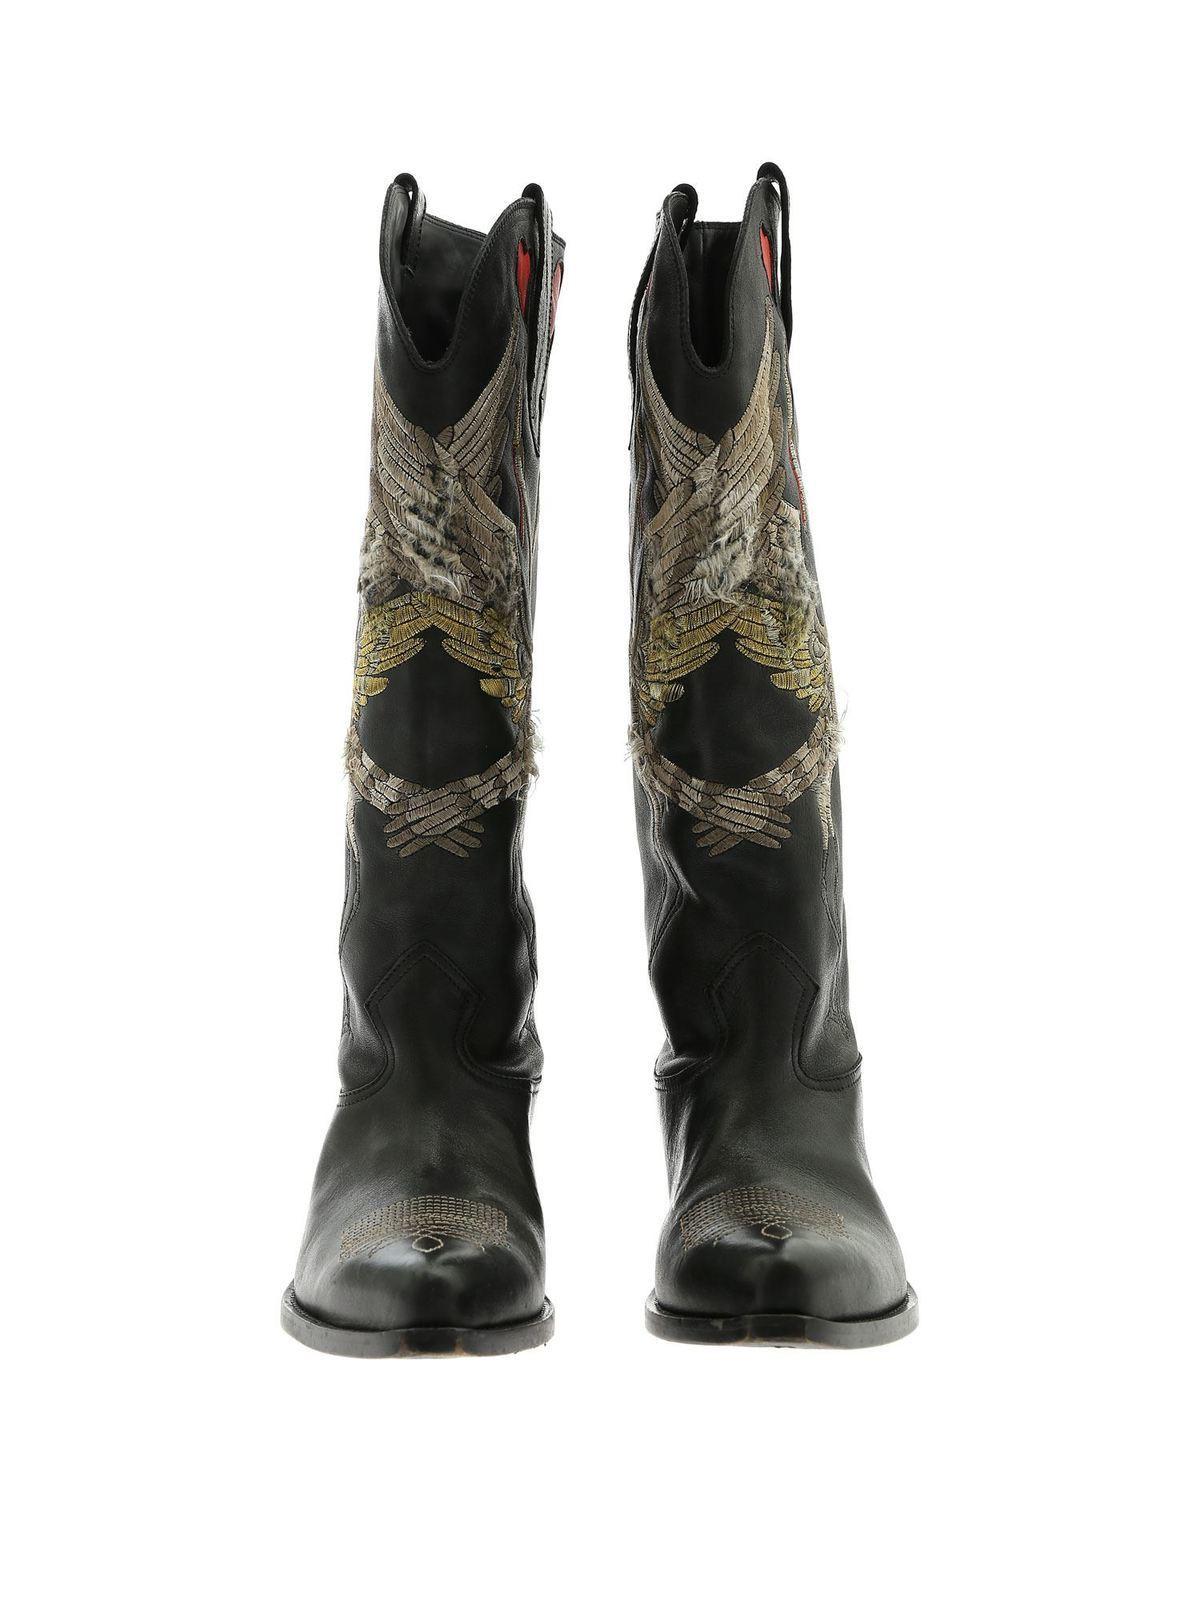 Golden Goose - Wish Star texan boots in